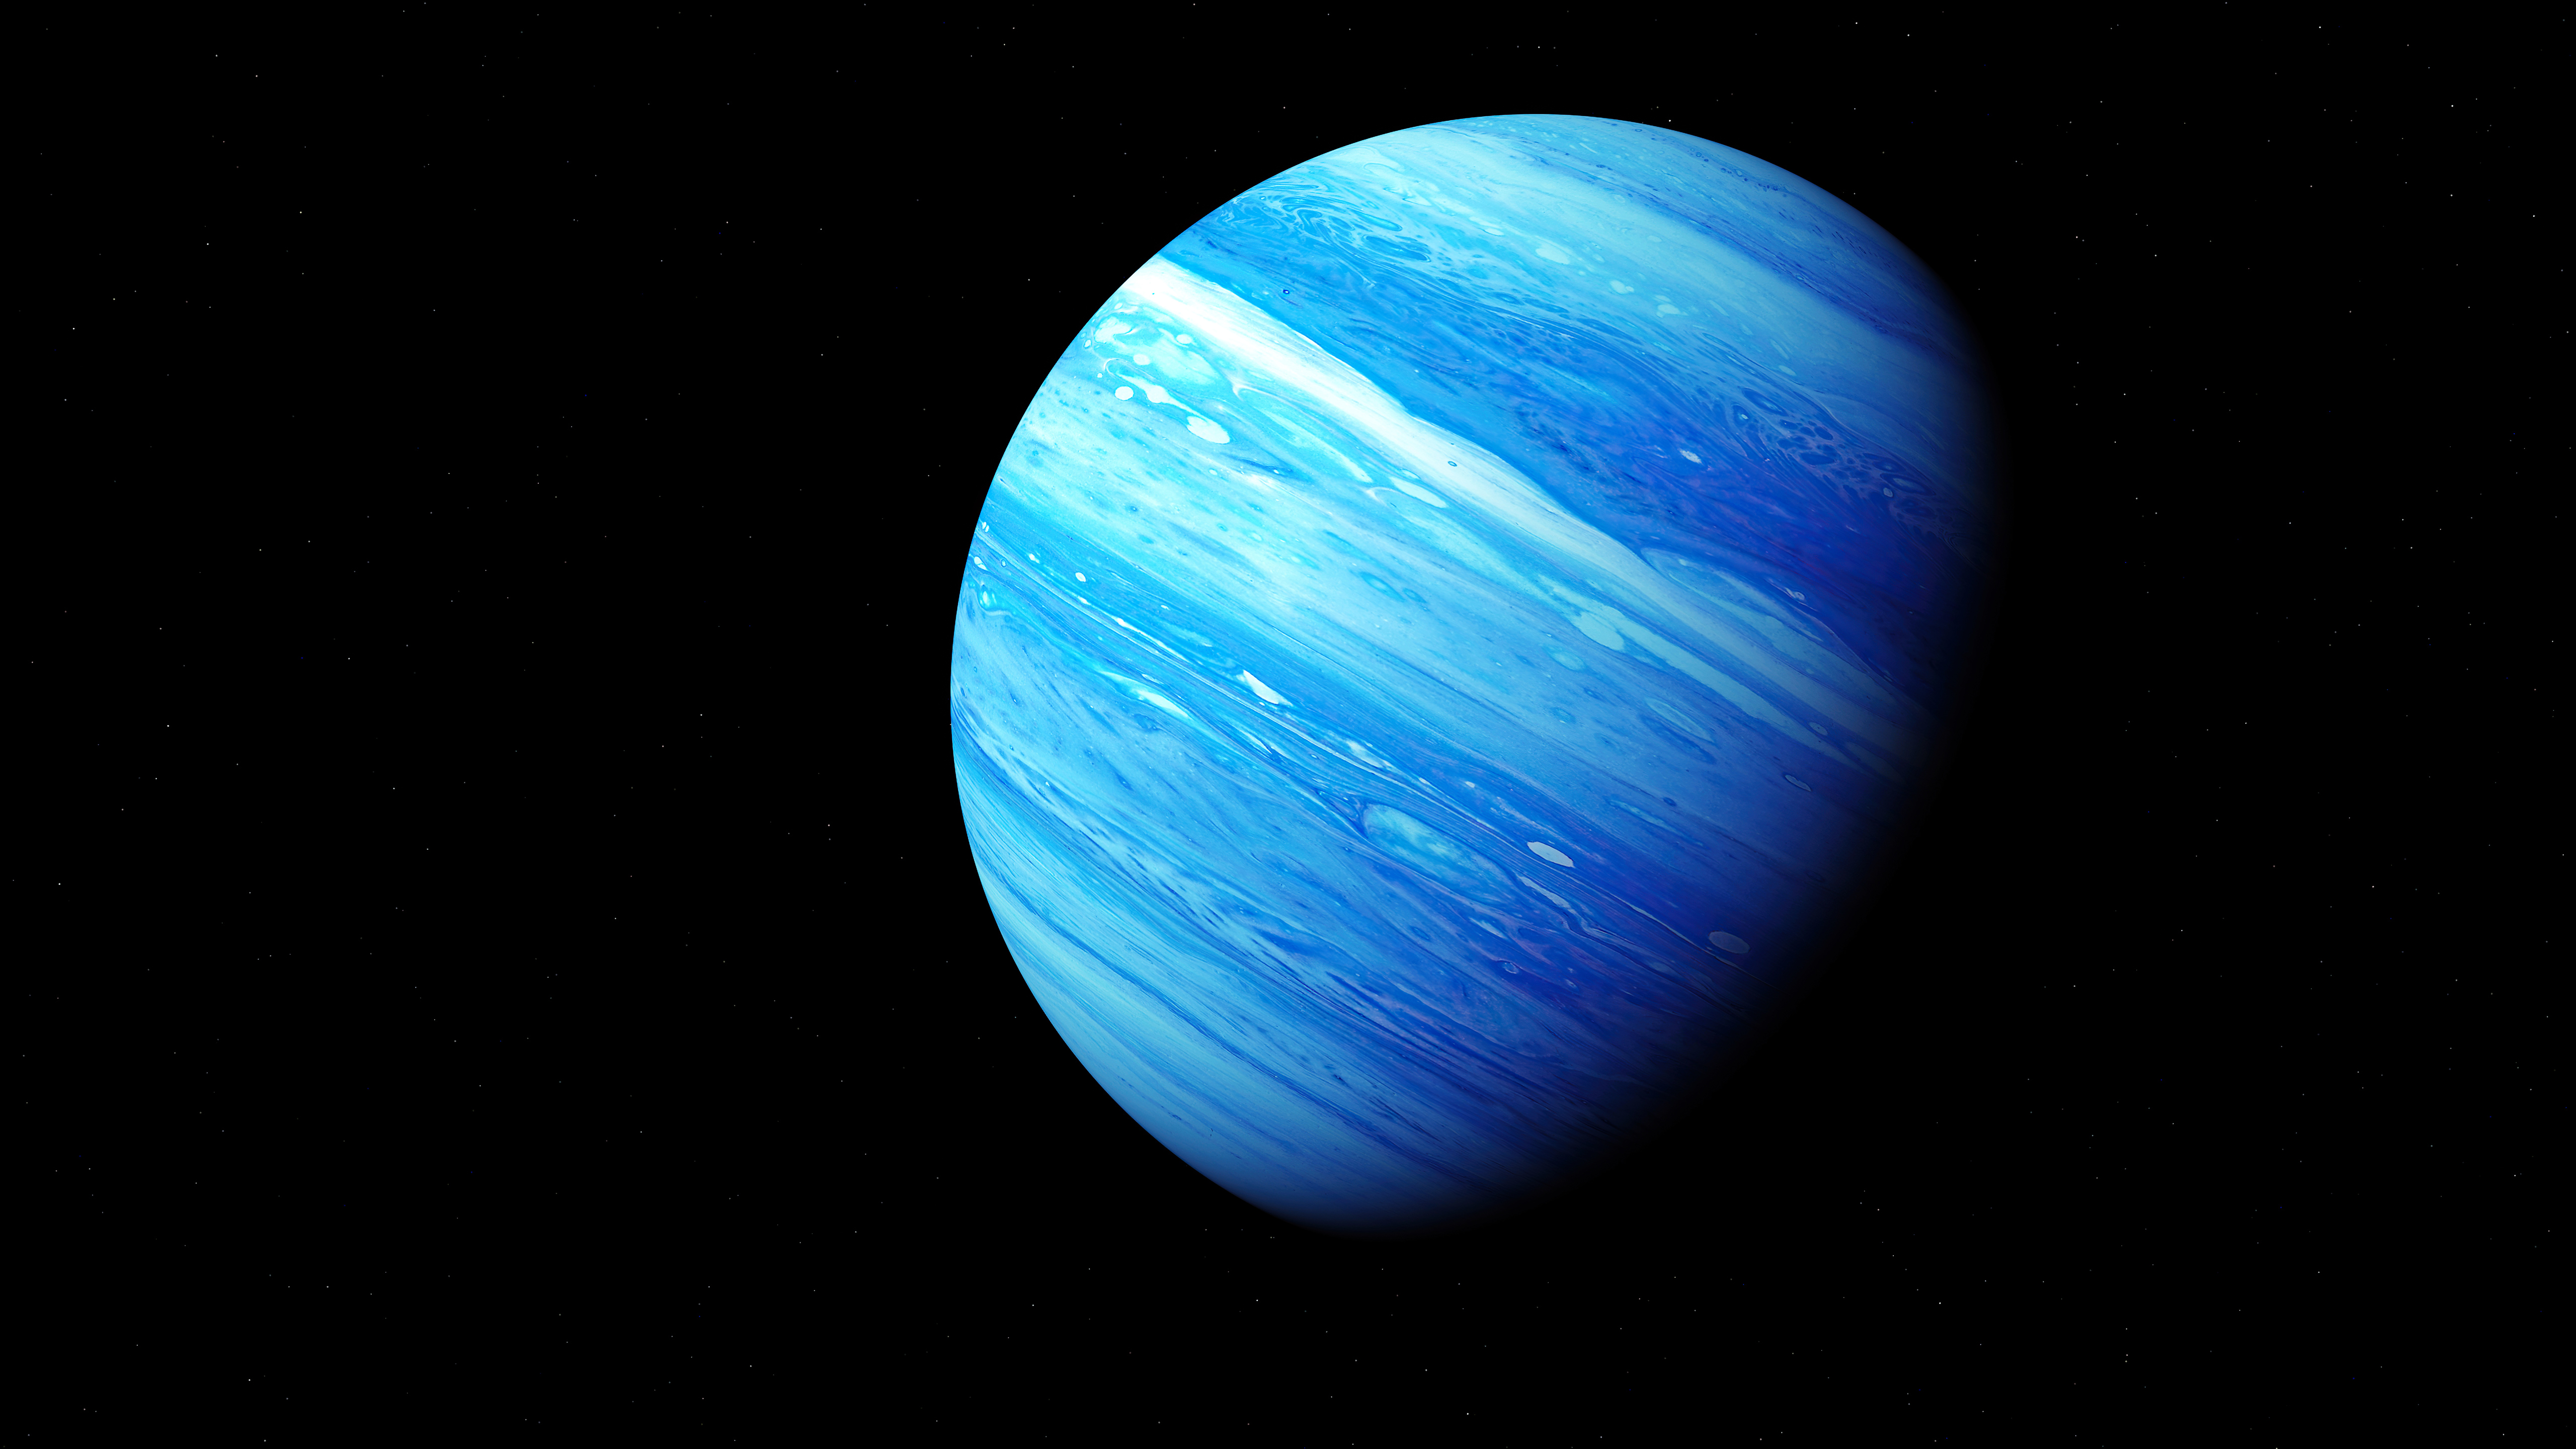 blue gas planet 4k 1629255909 - Blue Gas Planet 4k - Blue Gas Planet wallpapers, Blue Gas Planet 4k wallpapers